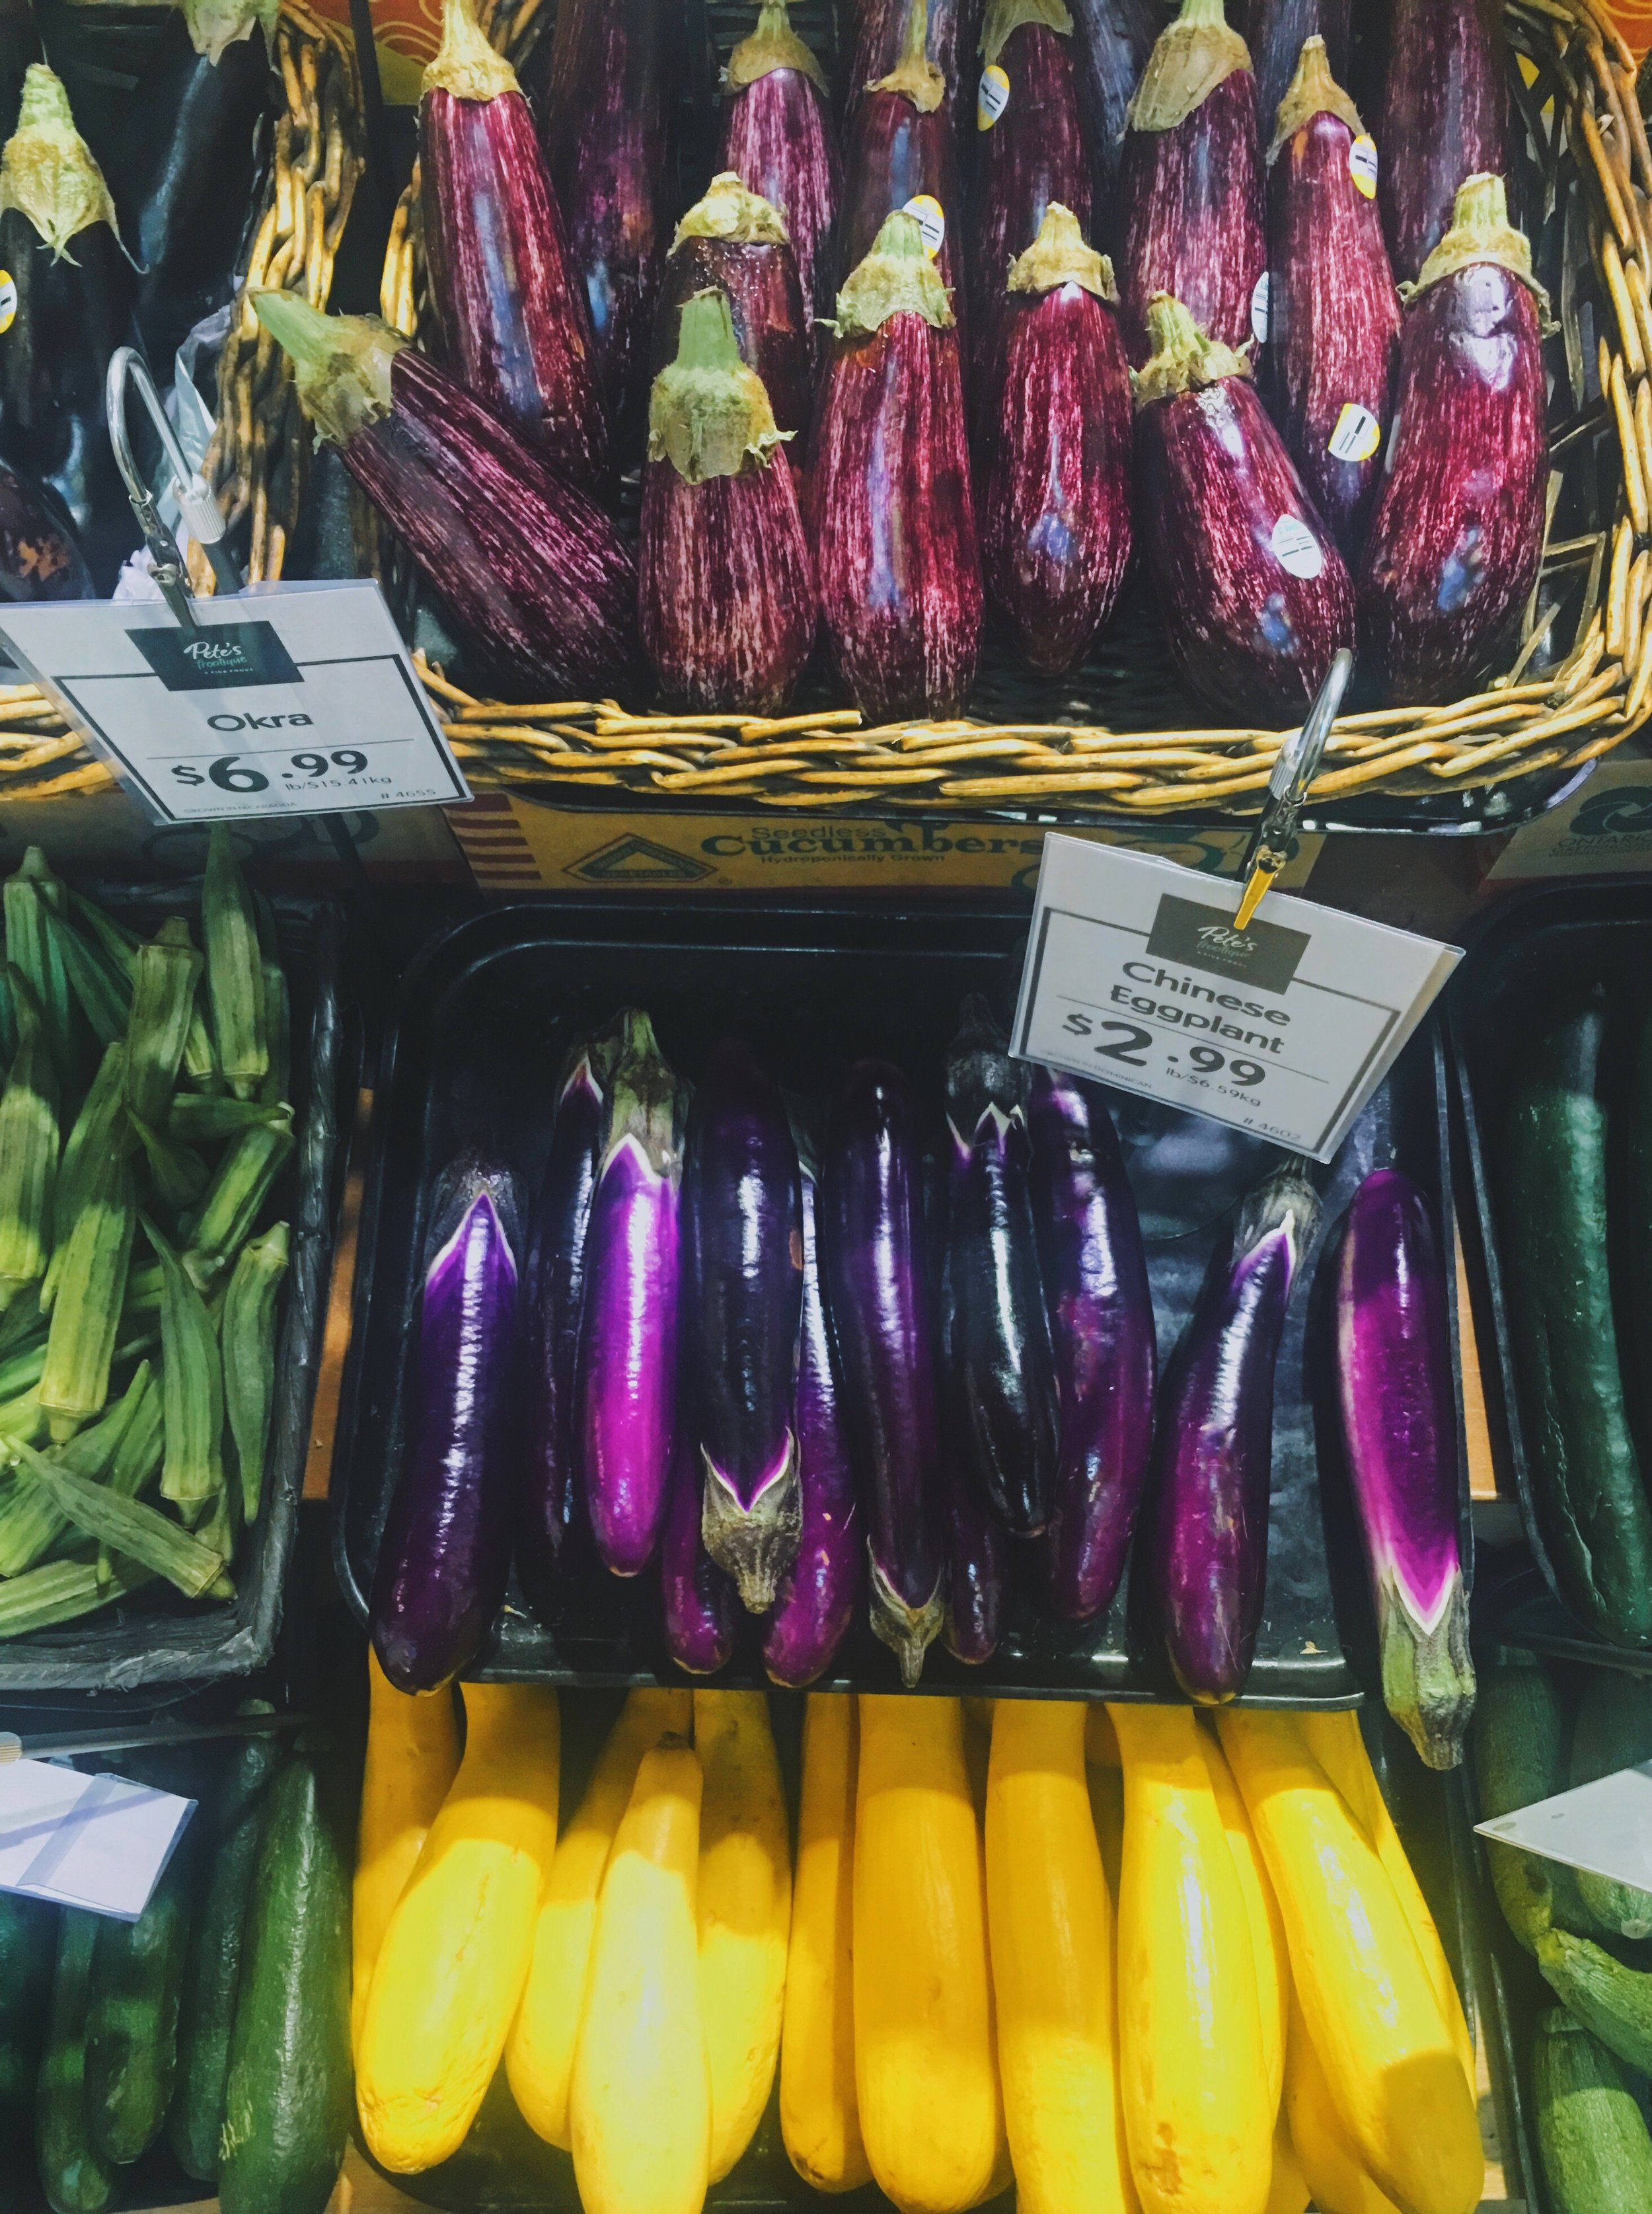 April 5th - Colourful vegetables